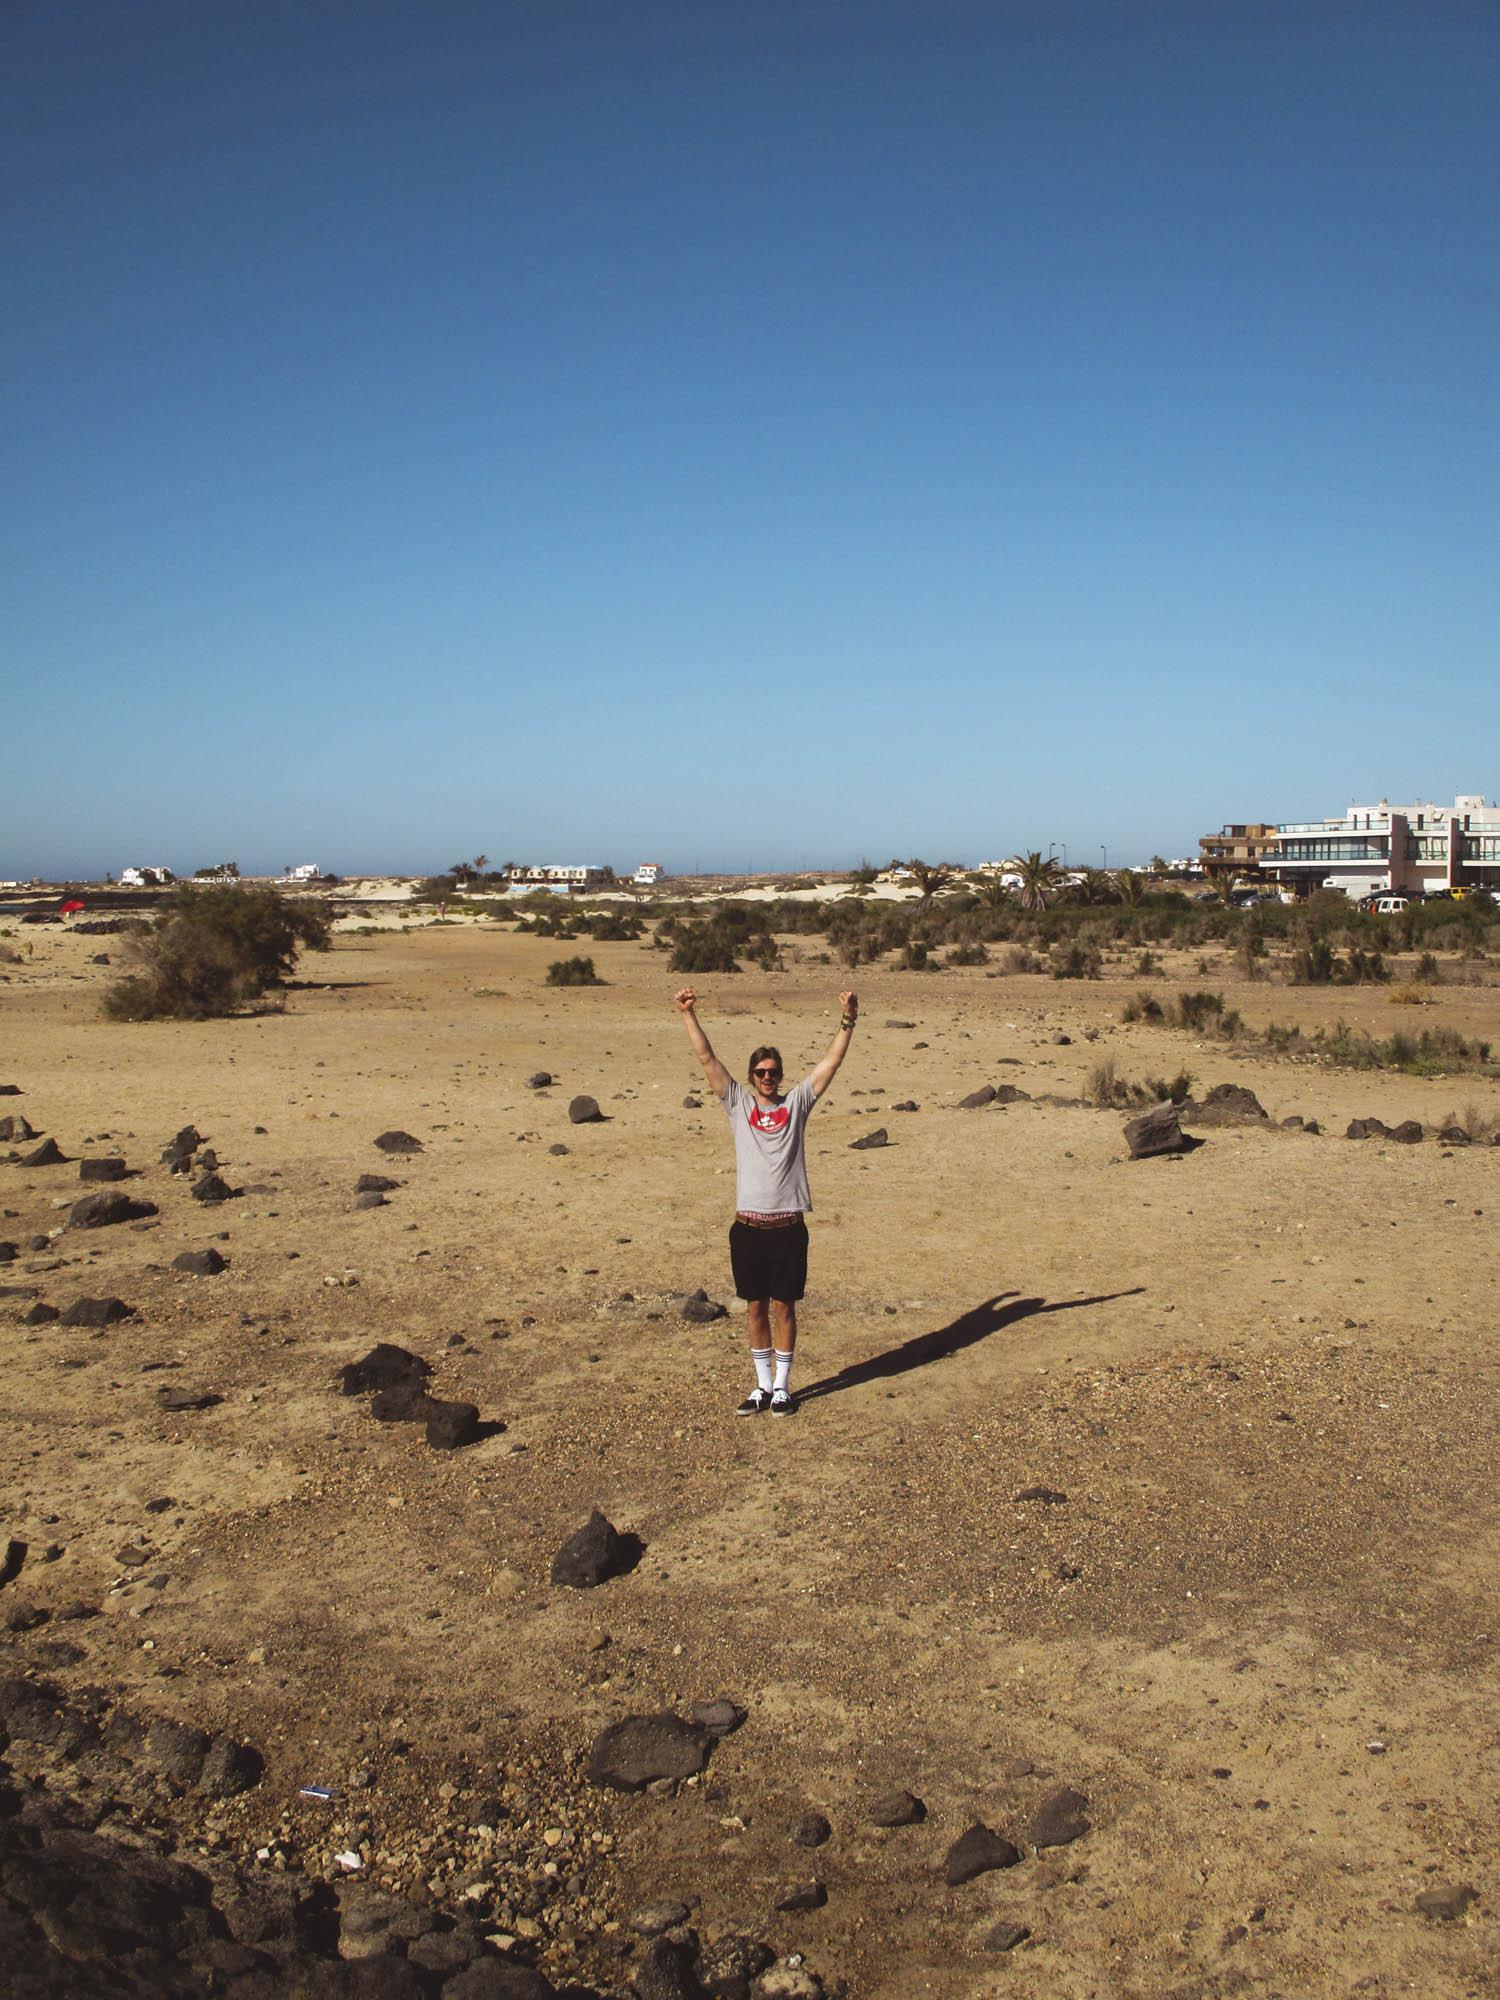 190213_Fuerteventura Kleine Kamera_IMG_1994.jpg